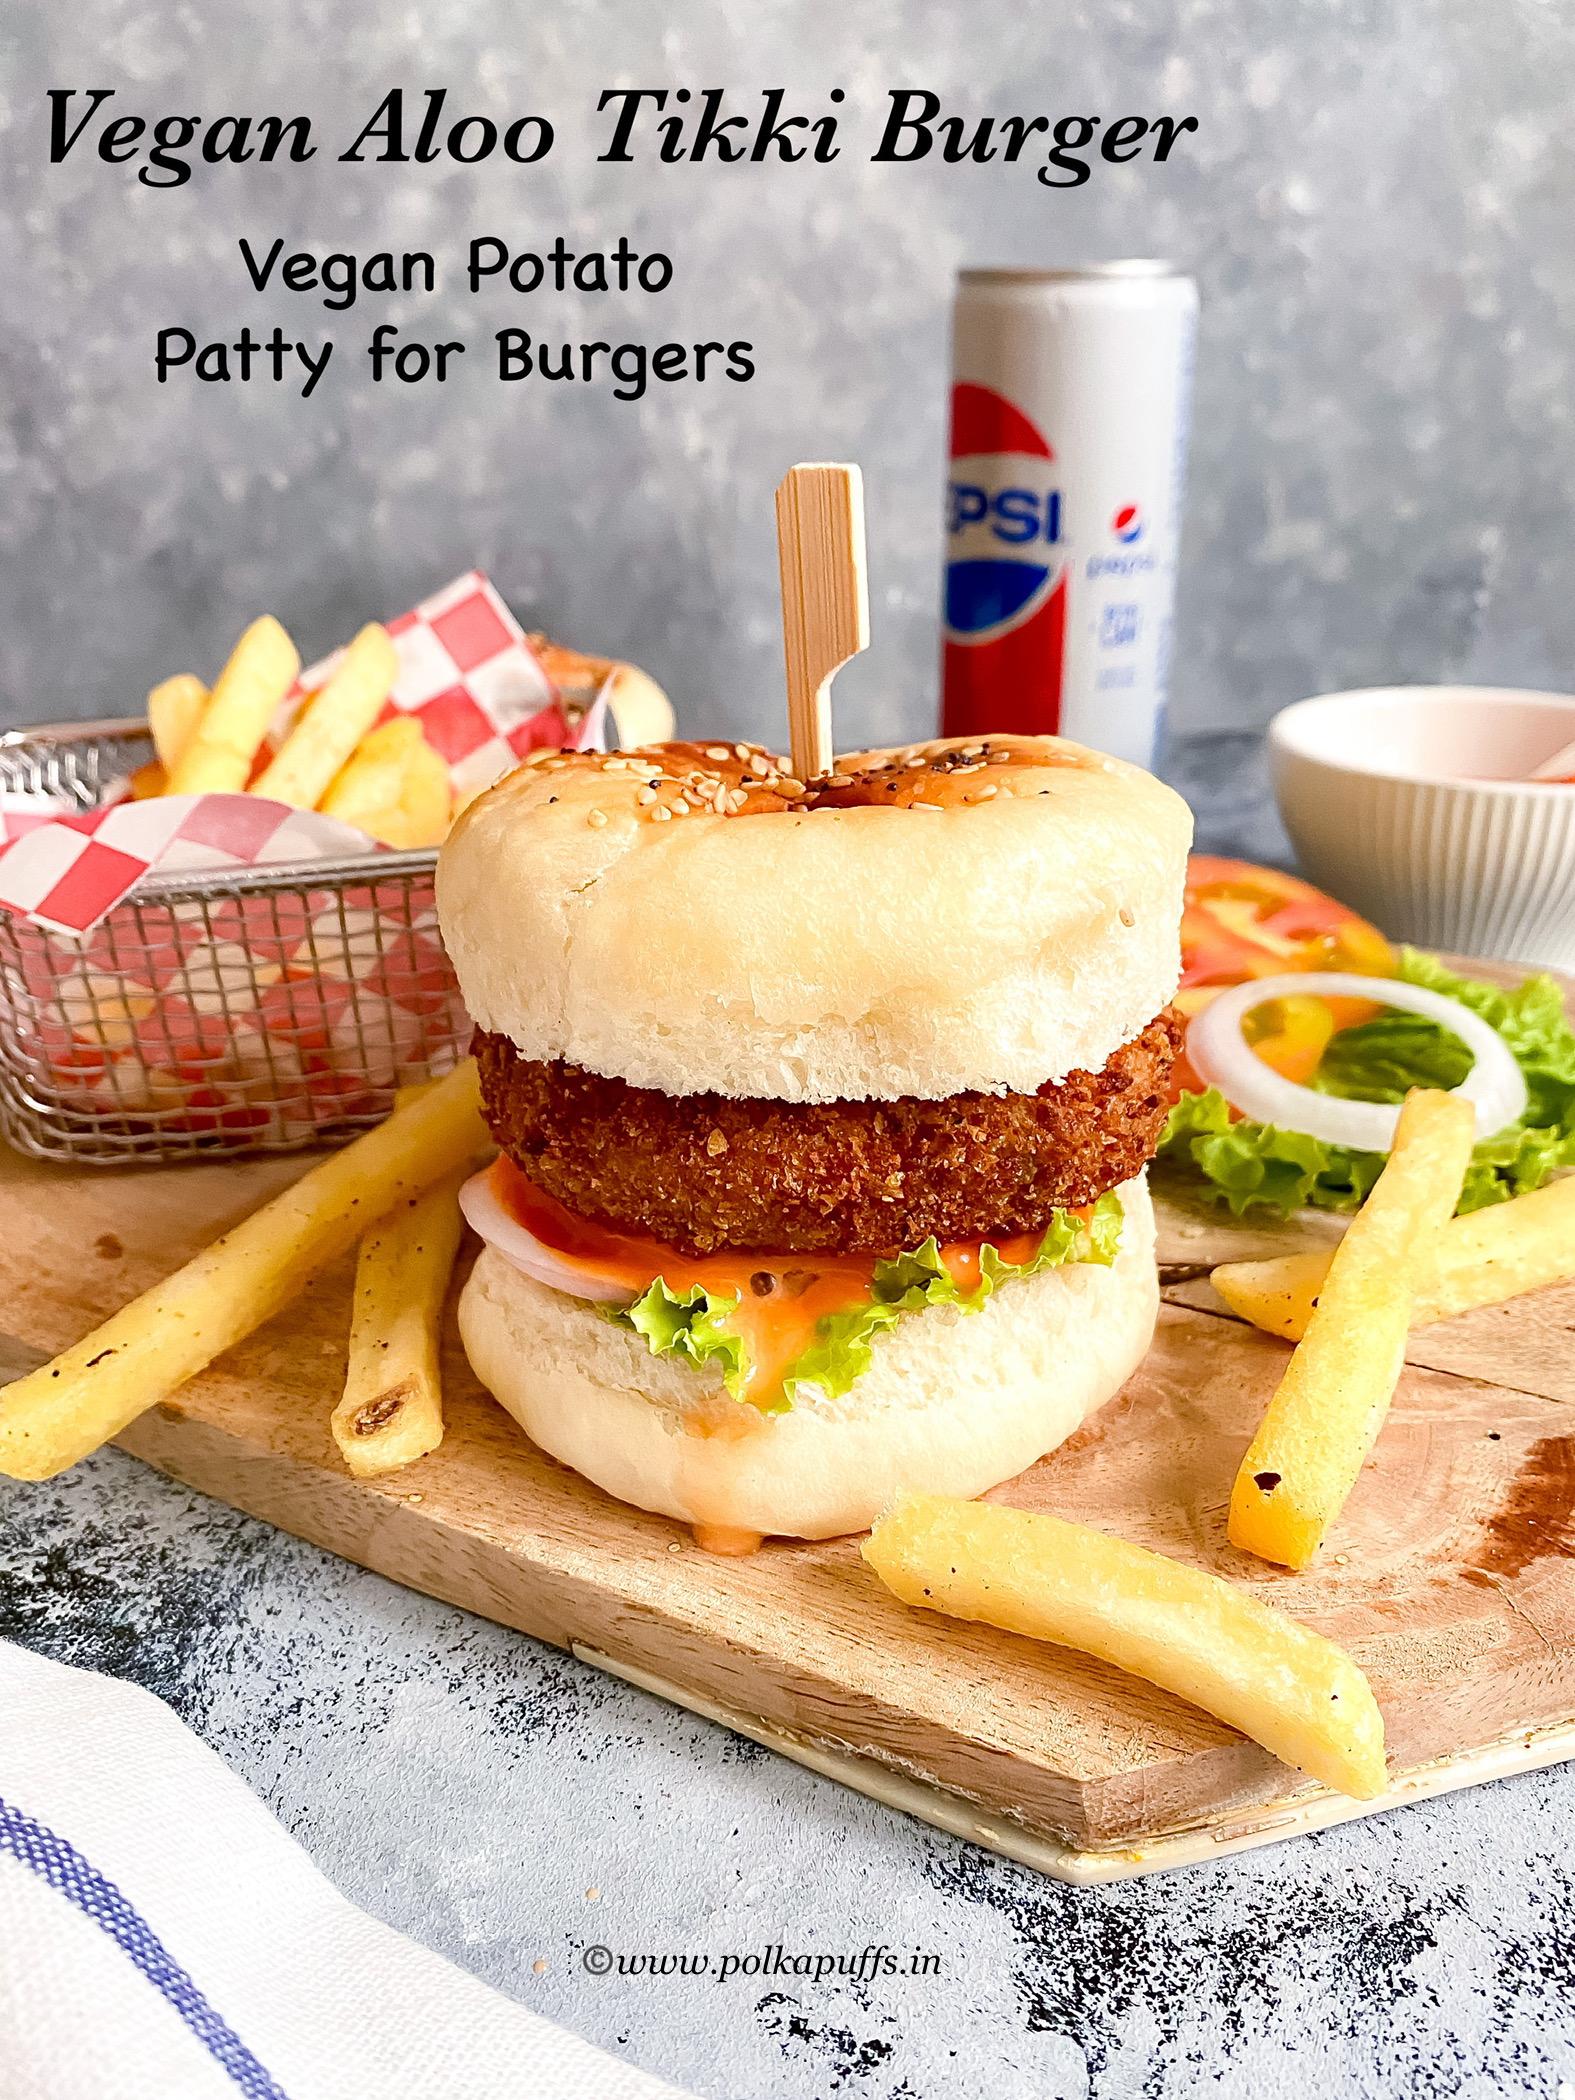 Veg Aloo Tikki Burger pinterest